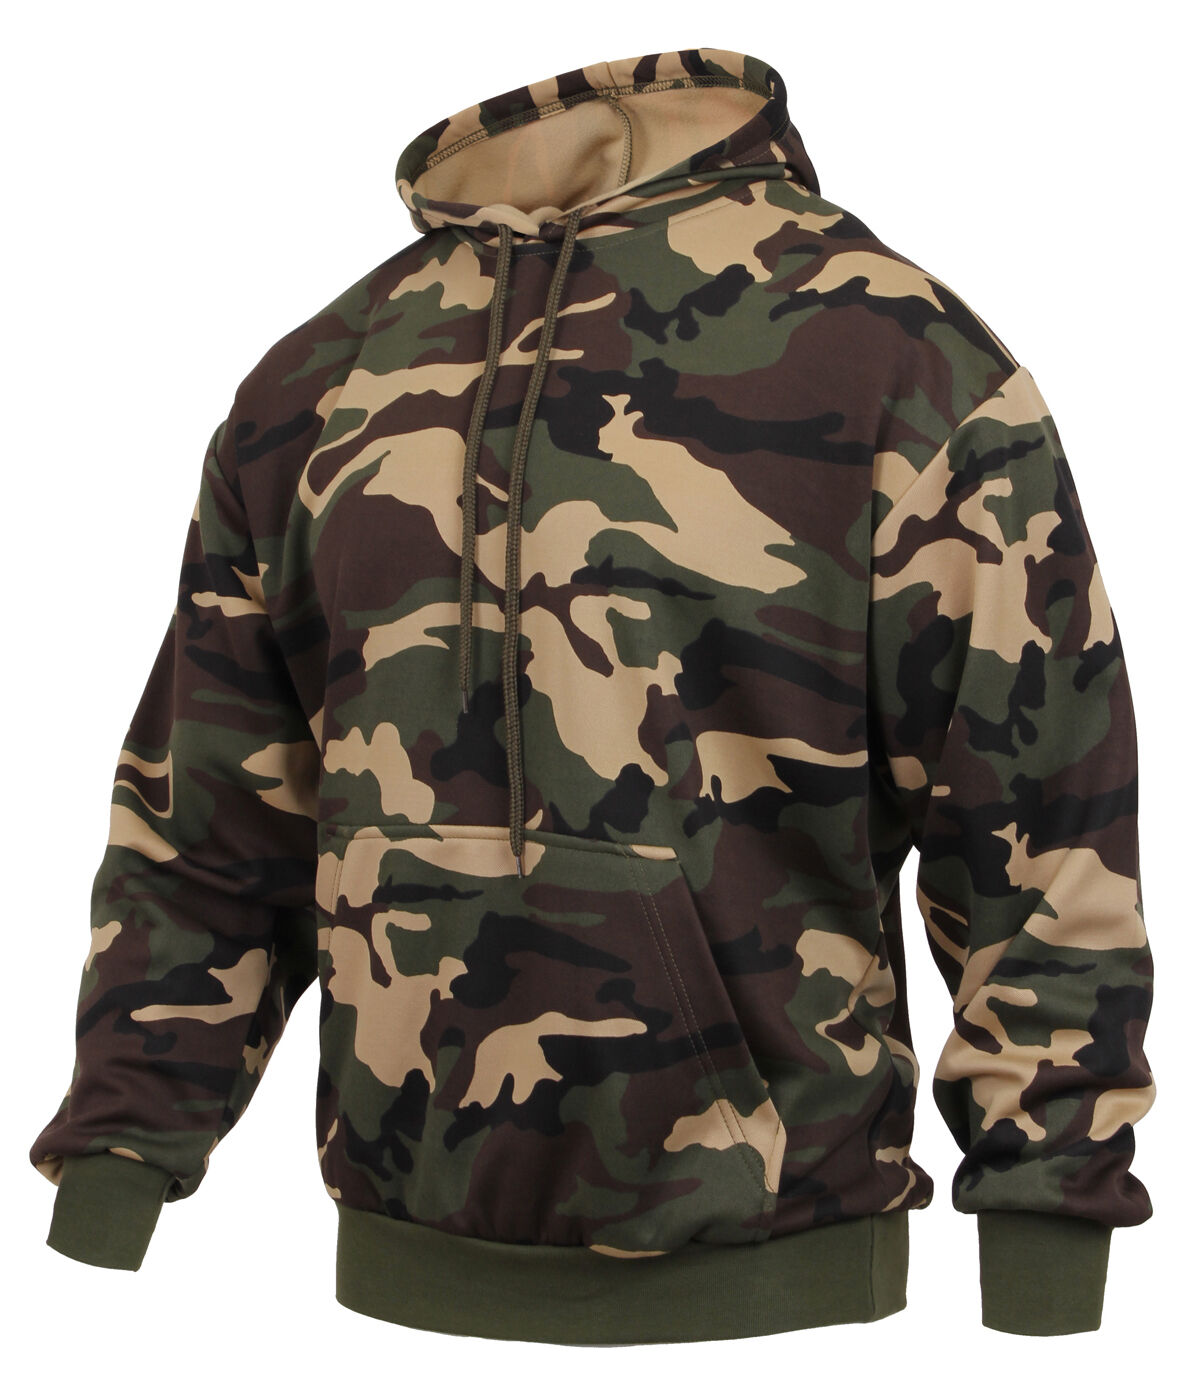 Hoodie woodland camo performance polyester material sweatshirt rothco 2871